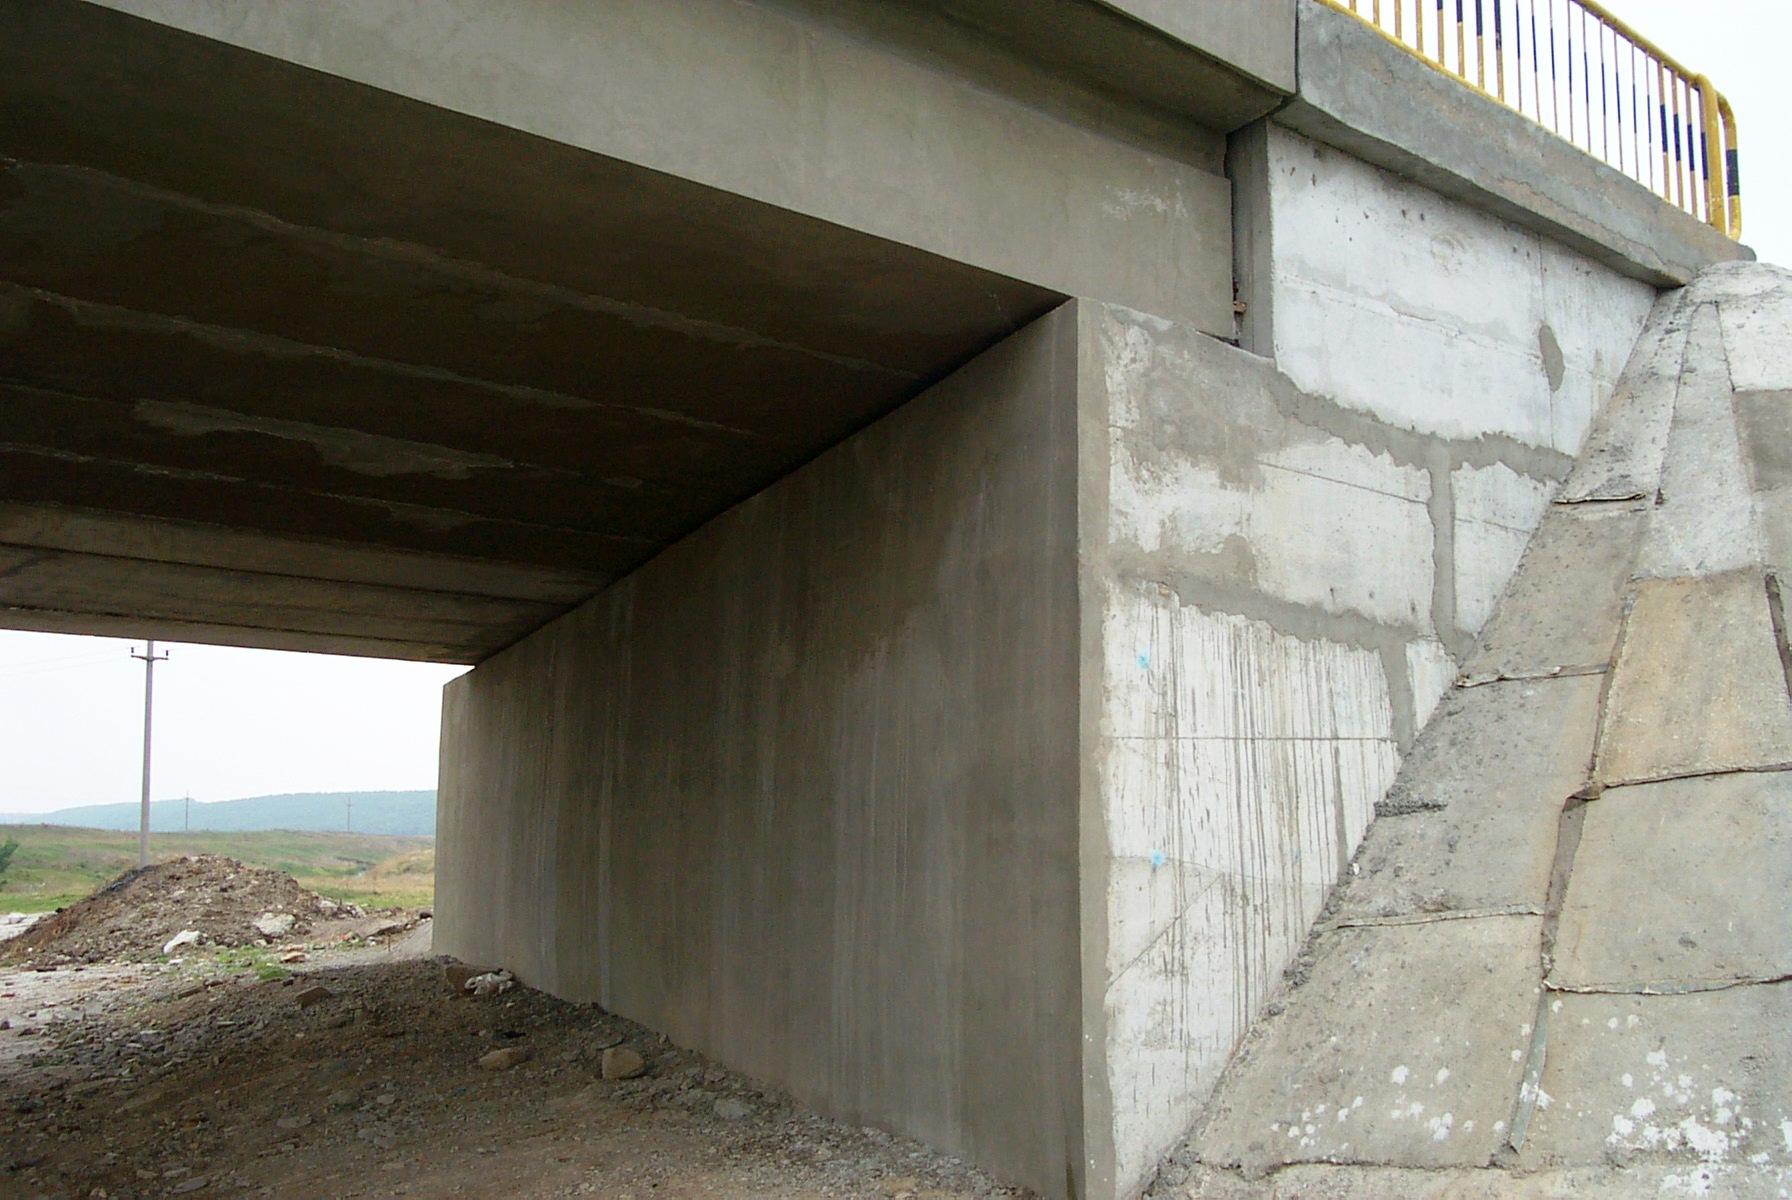 Reparatii pod (DN2), Km. 33 - 028, peste raul Calnistea MAPEI - Poza 115